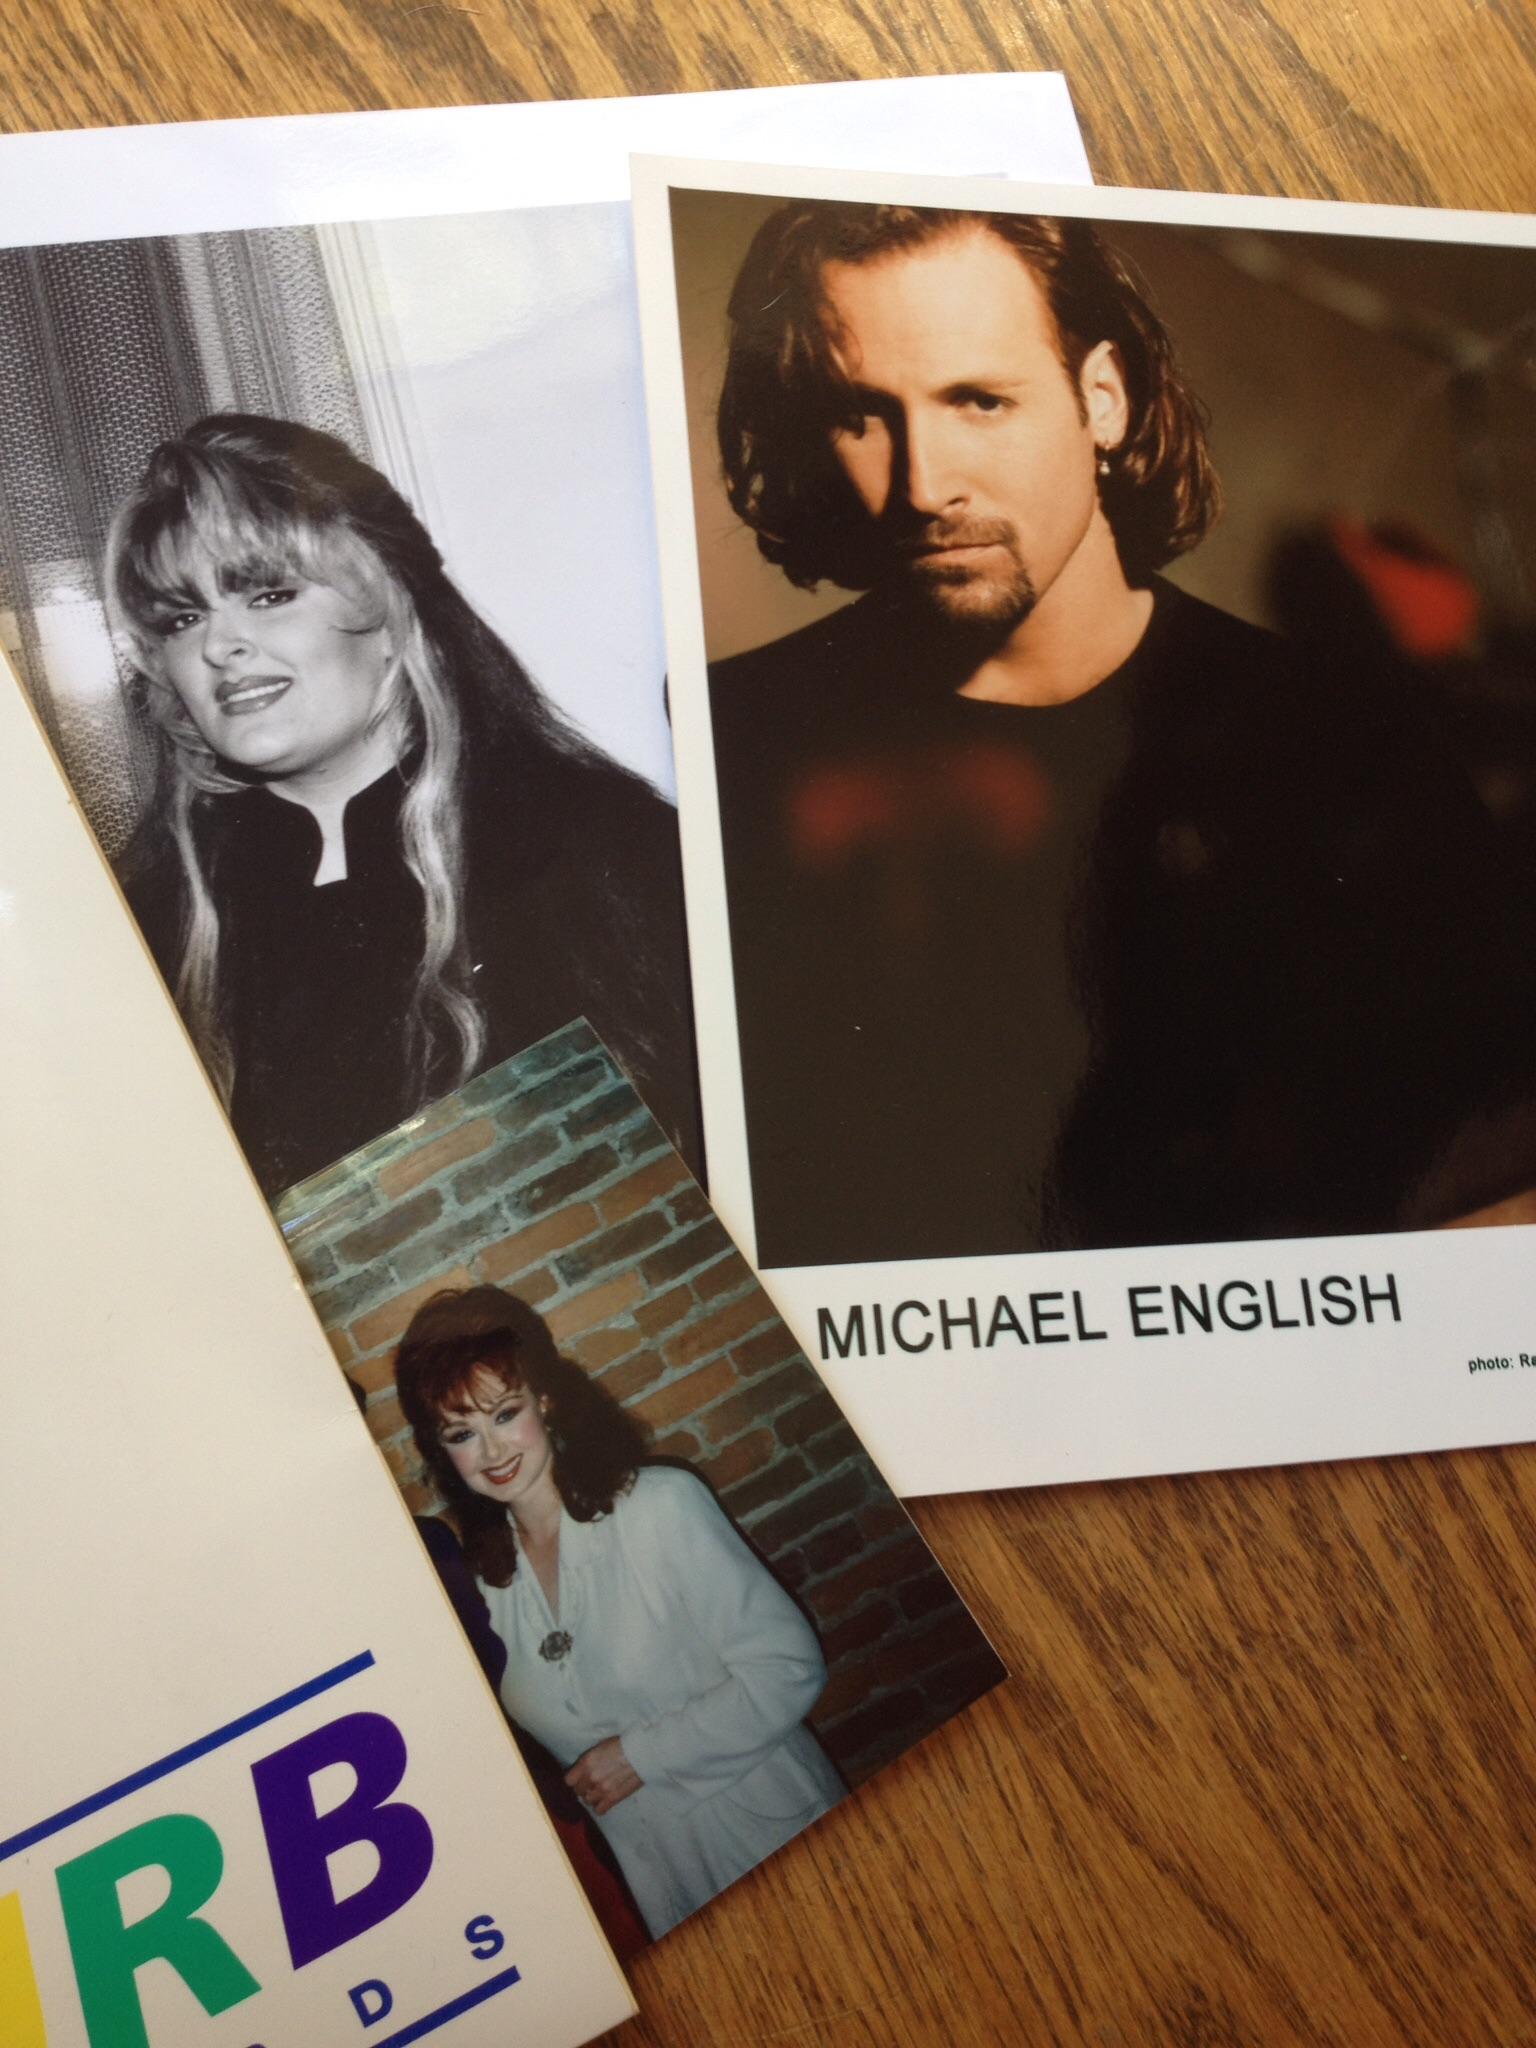 Wynonna, Michael English & snapshot of Naomi.